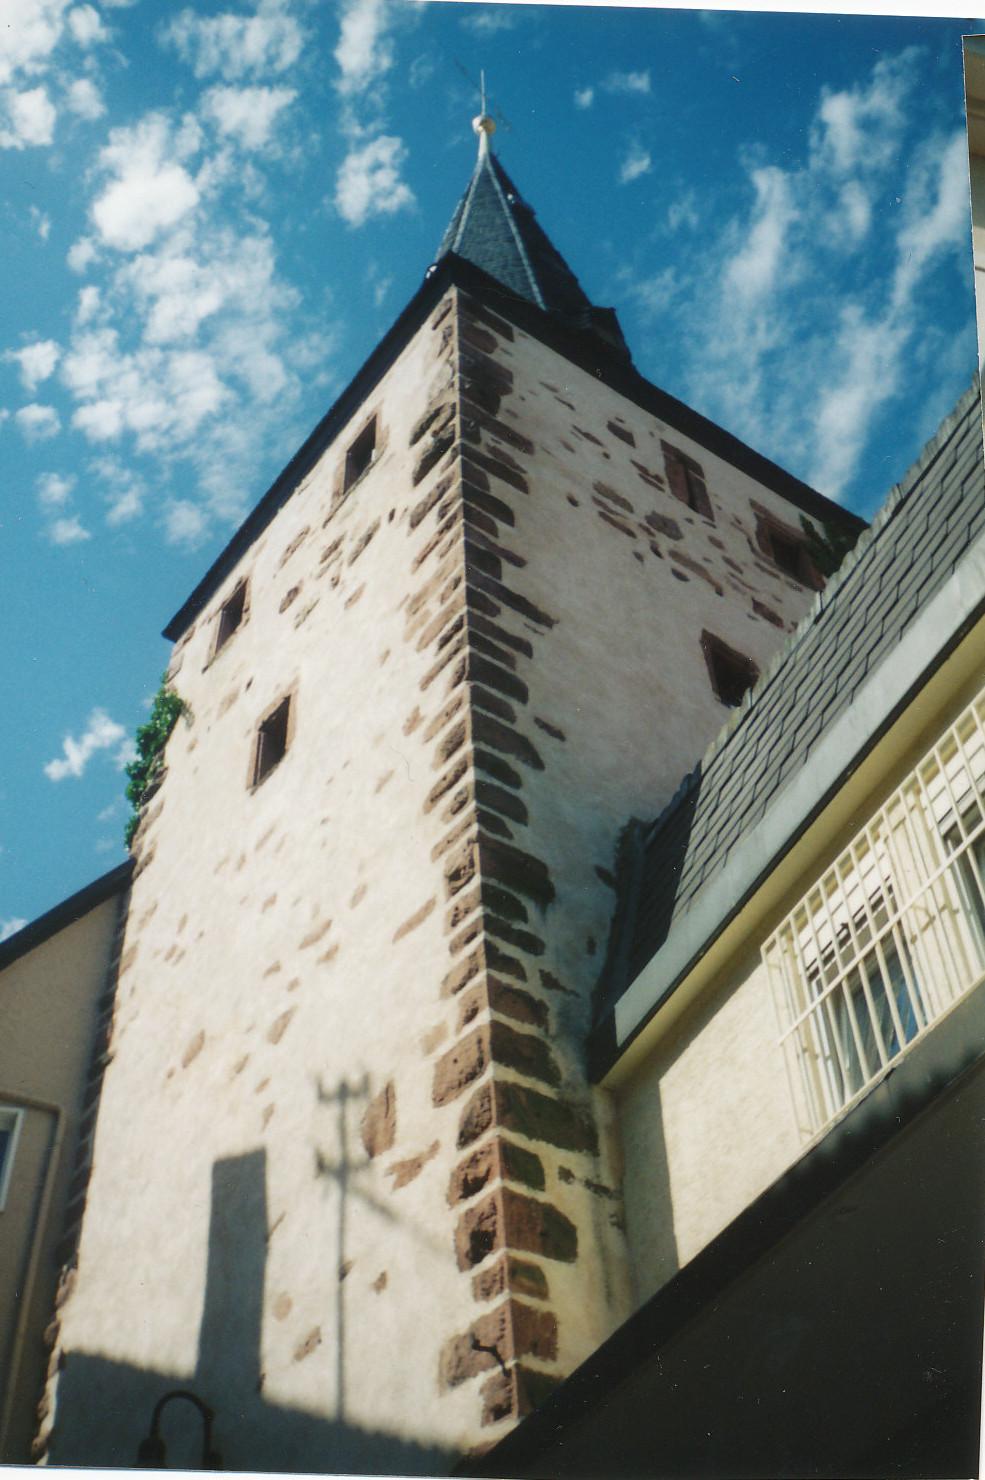 eberbach building